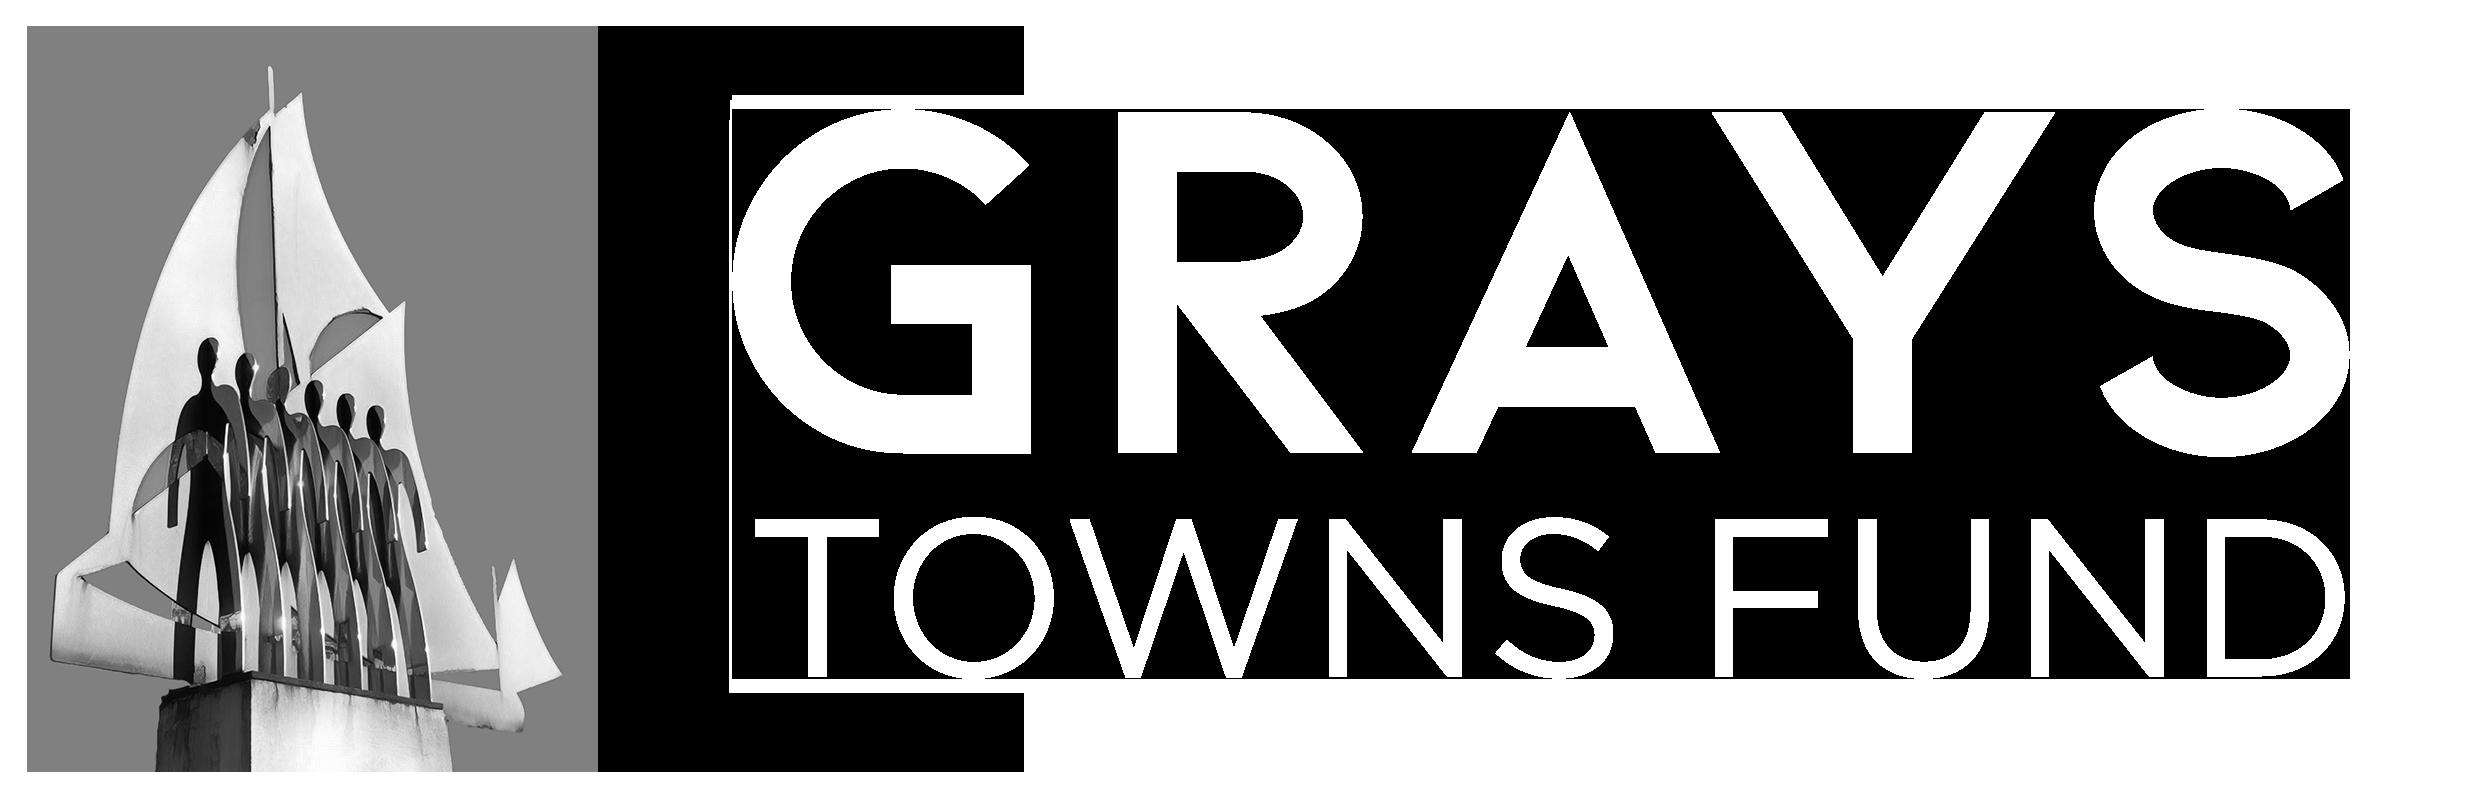 Grays Towns Fund